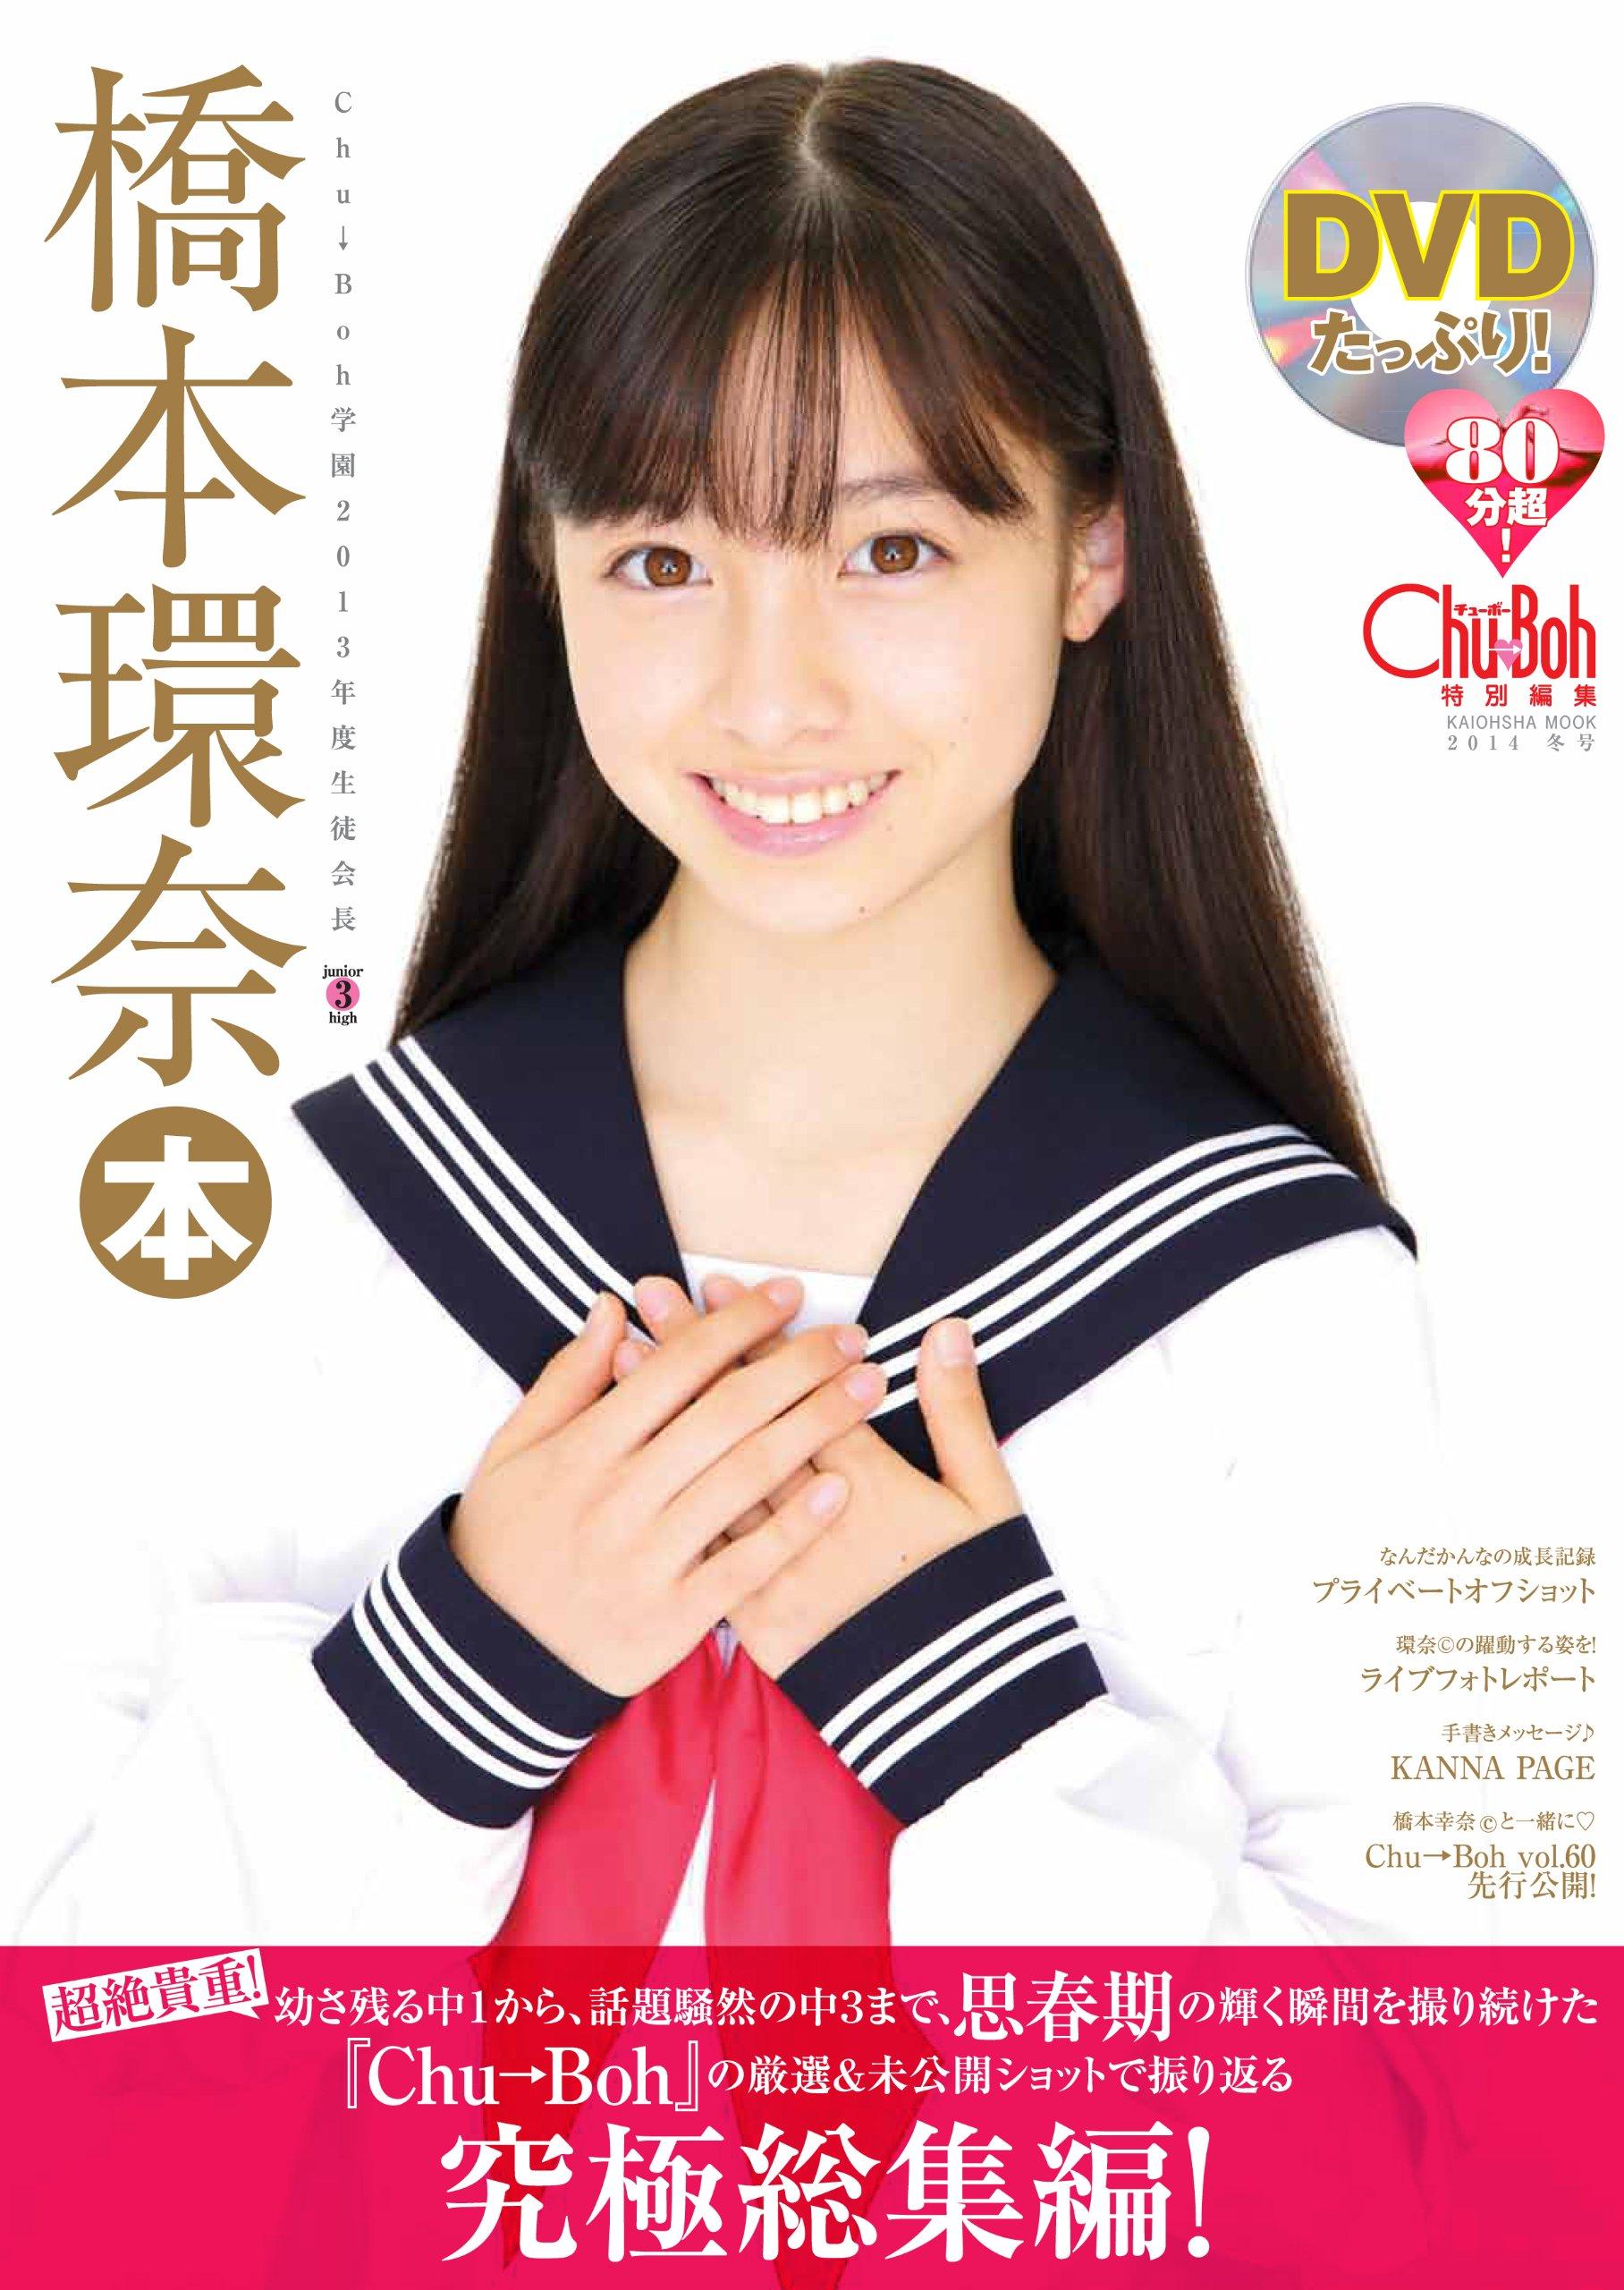 [978-4796460897] Kanna Hashimoto 橋本環奈 – Chu→Boh 橋本環奈本